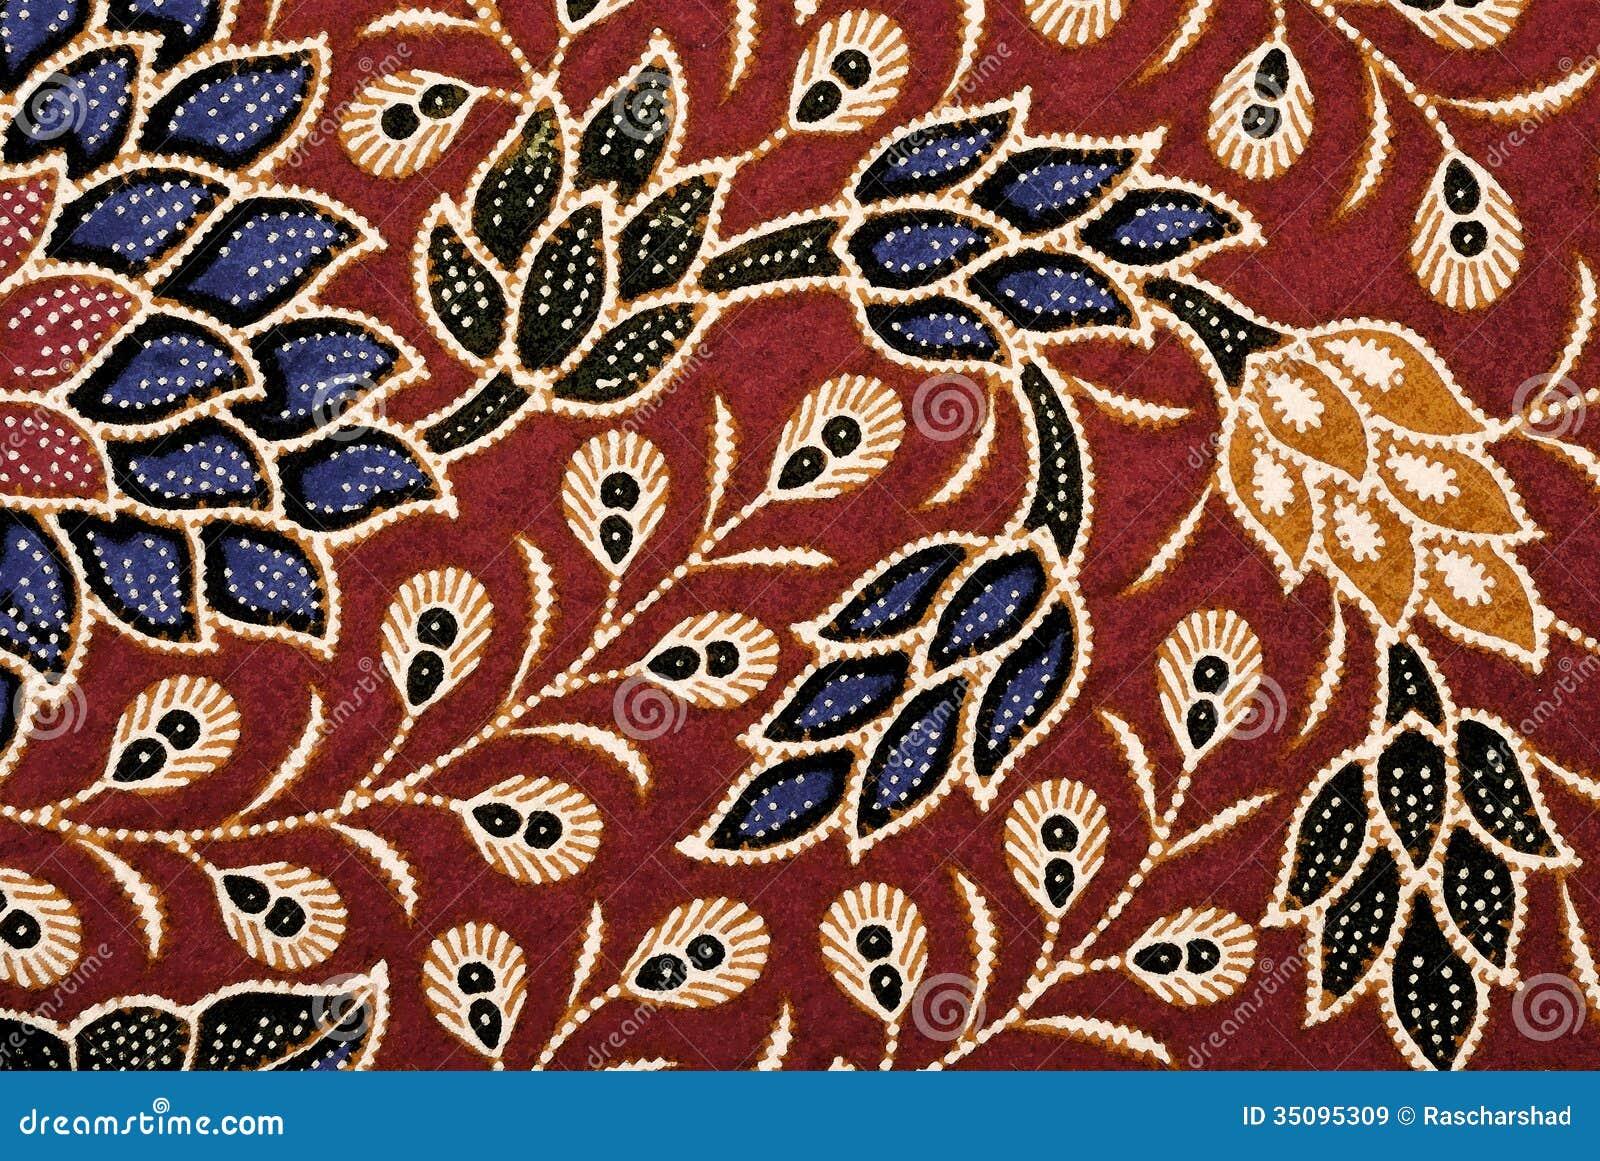 Digital Art Batik Floral Royalty Free Stock Images - Image